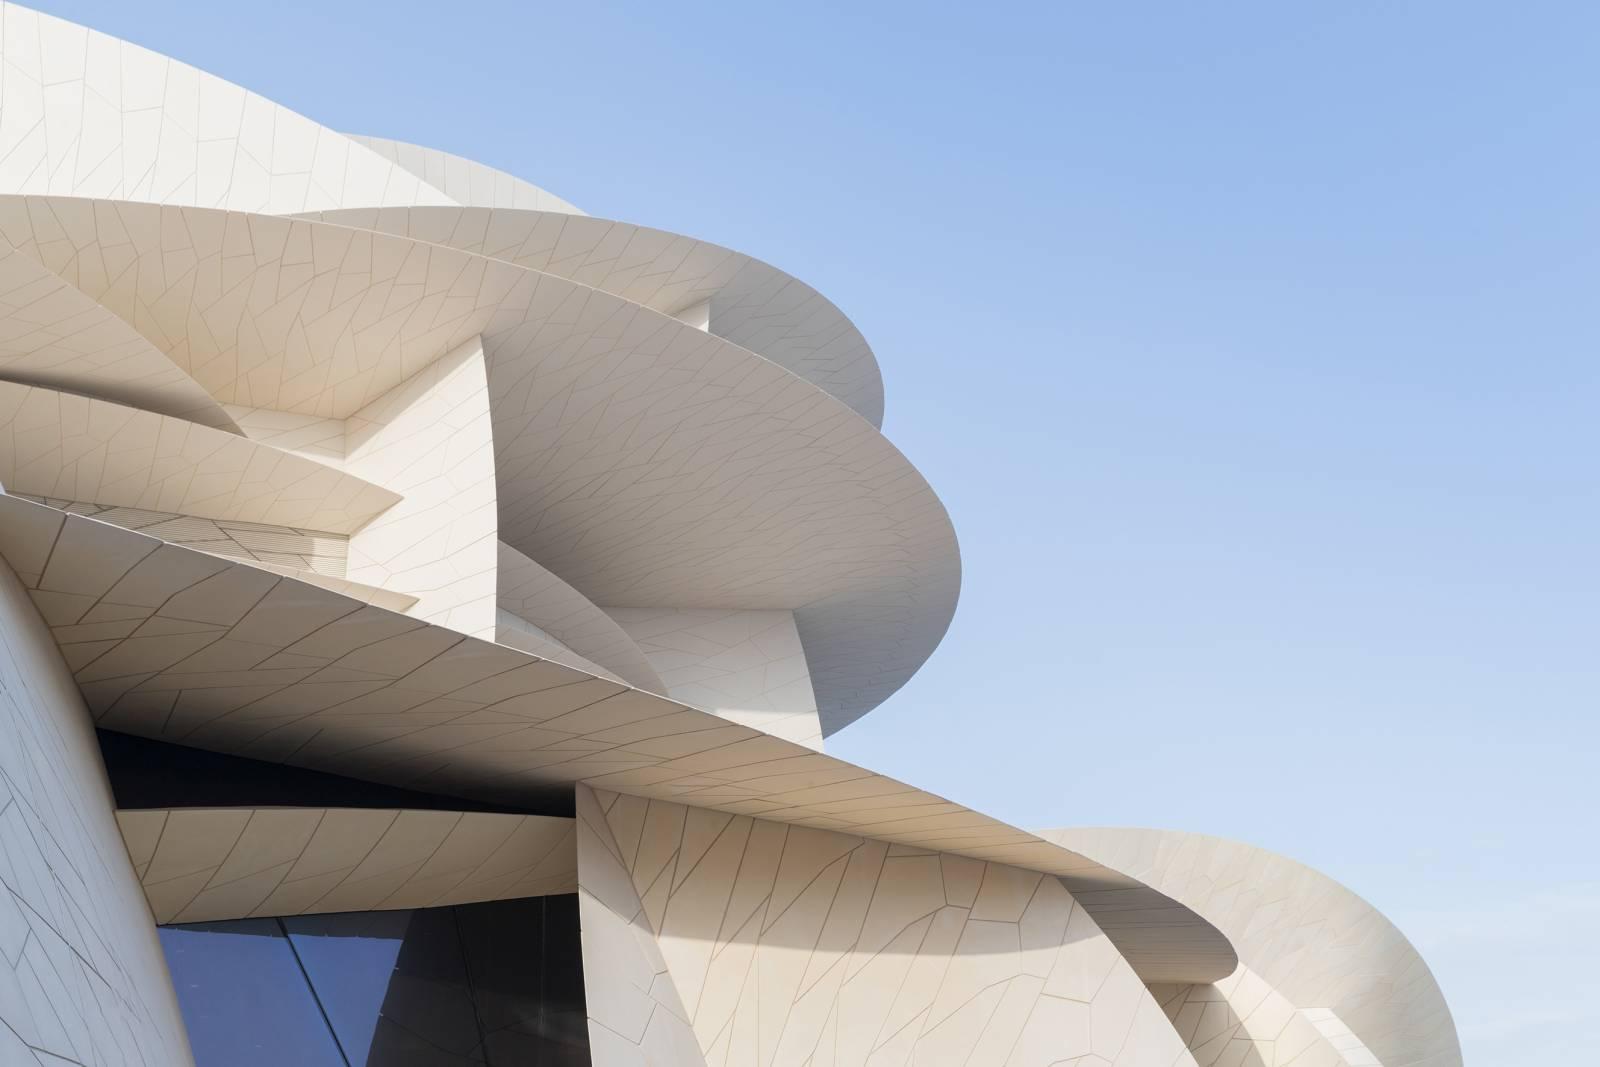 National Museum of Qatar   Doha, Qatar